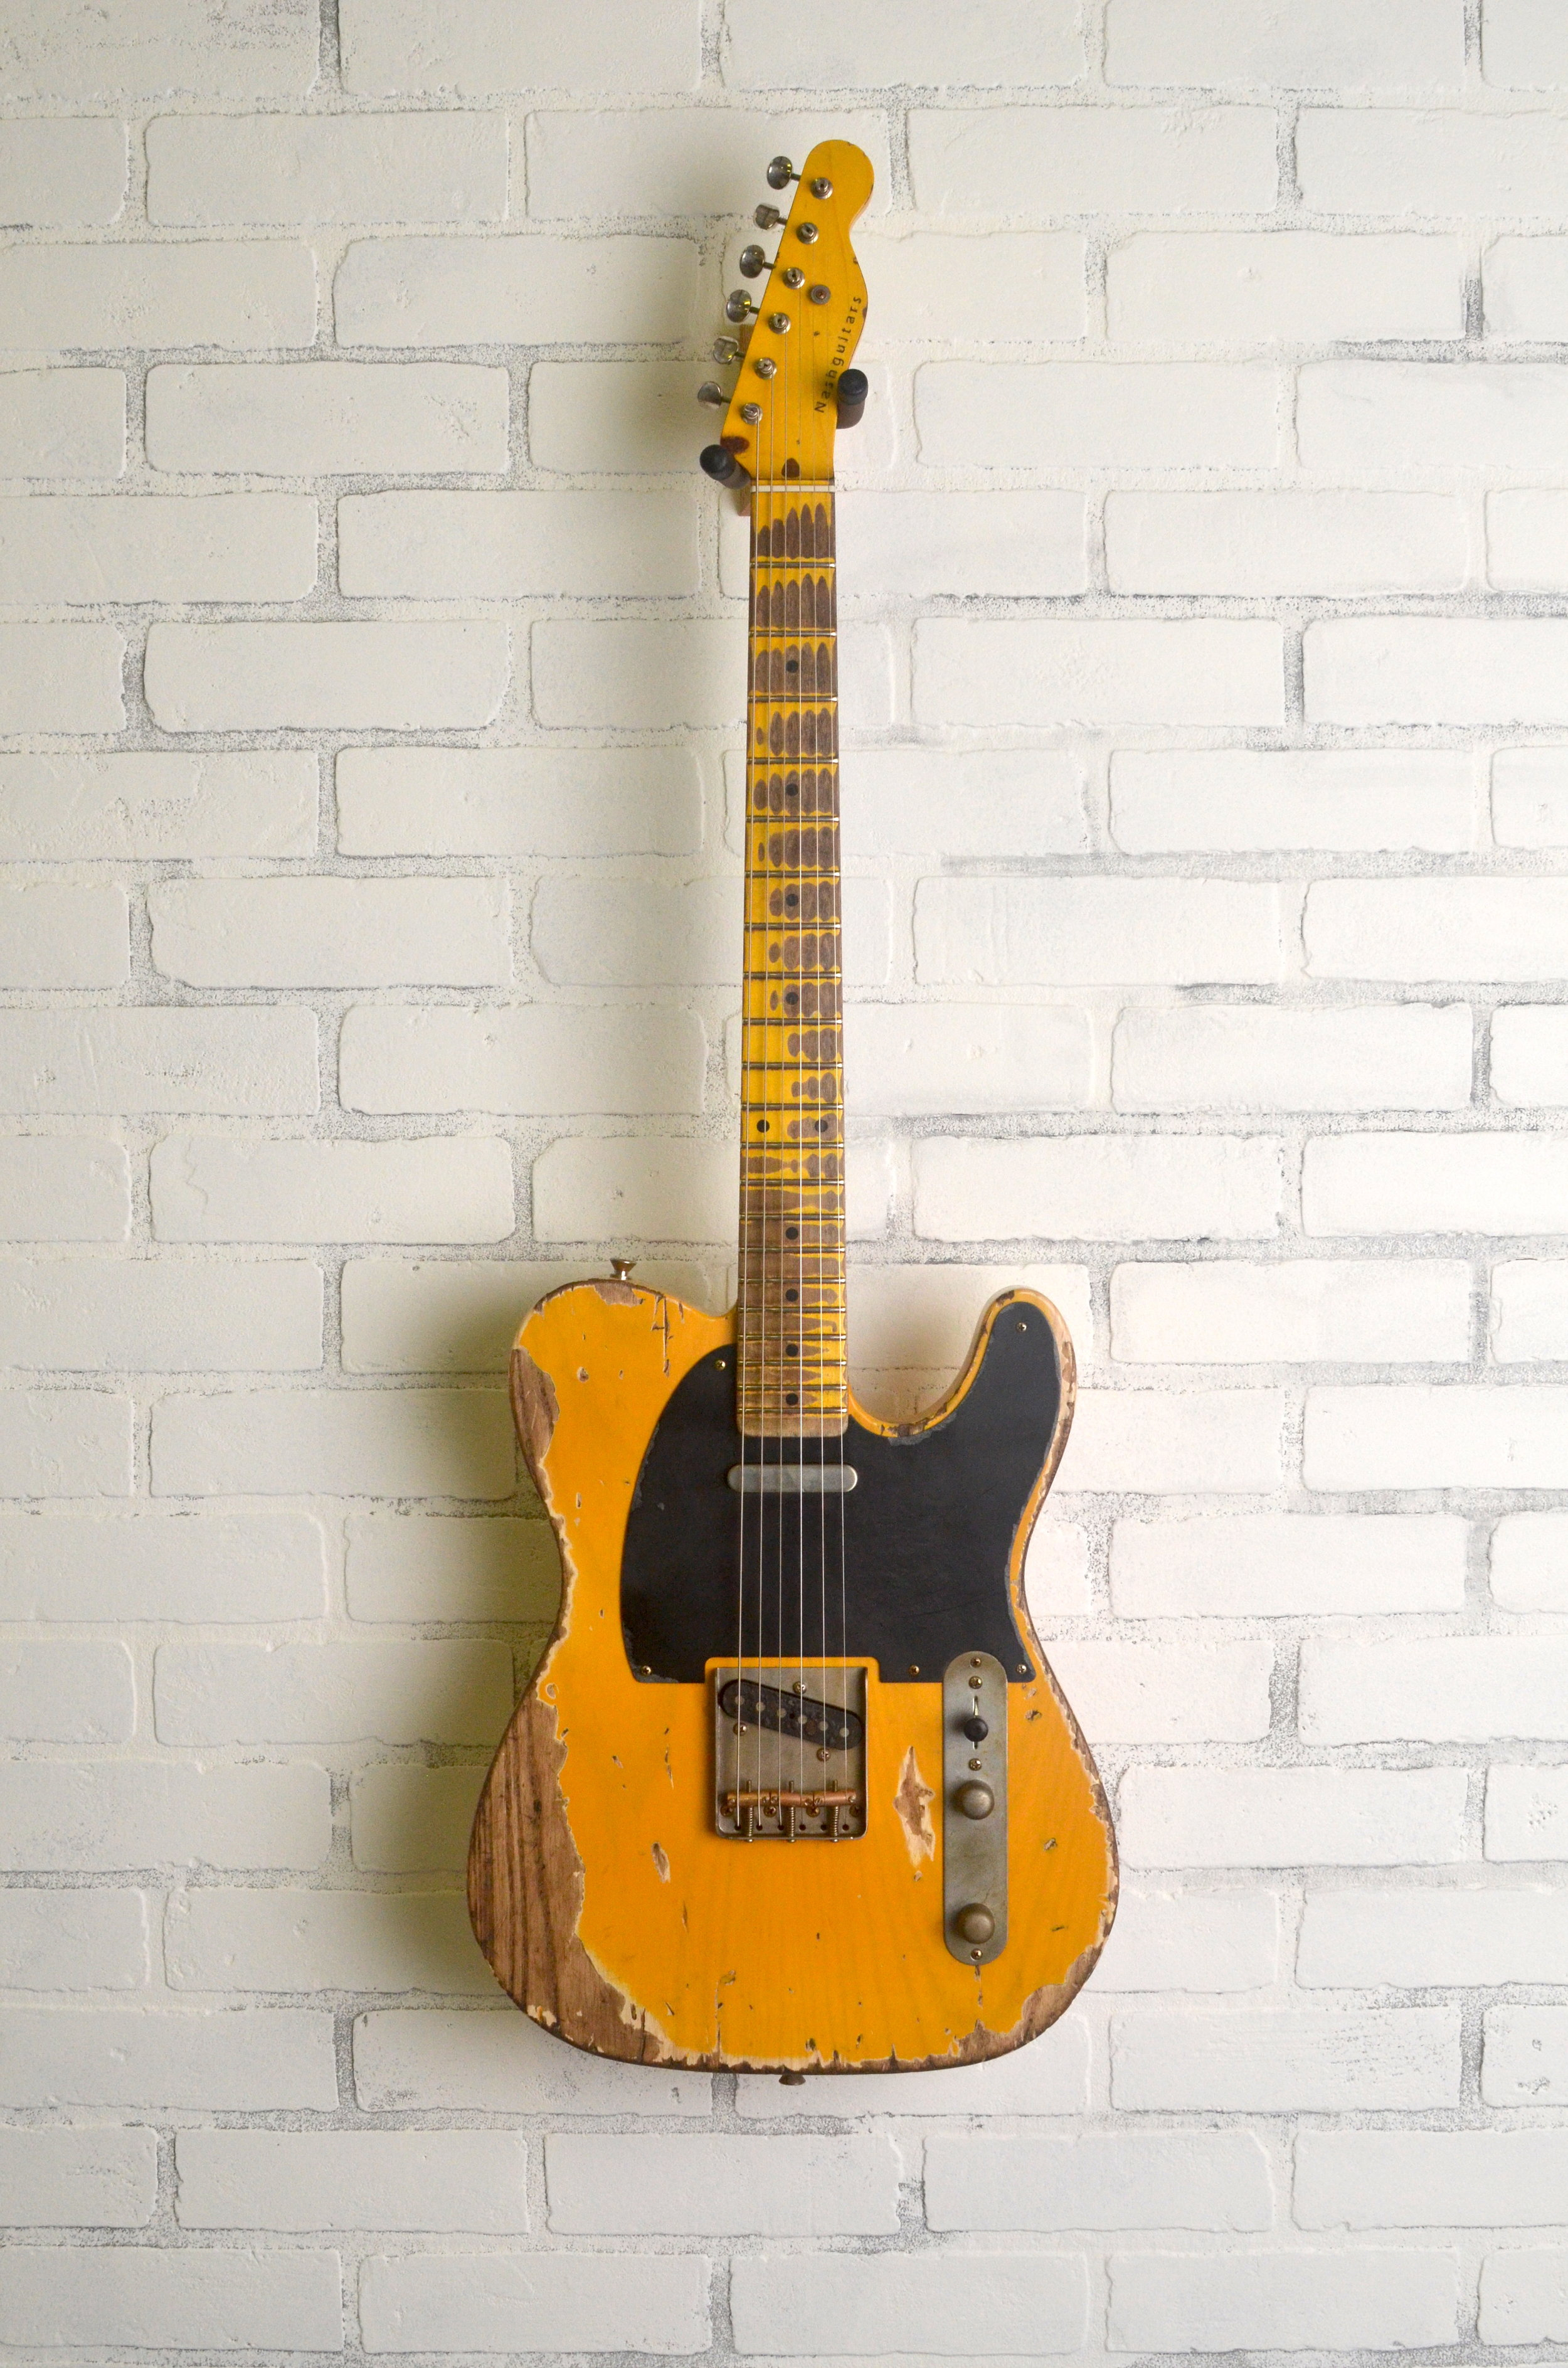 Nashguitars Nash Stratocaster Guitar Wiring Diagram on